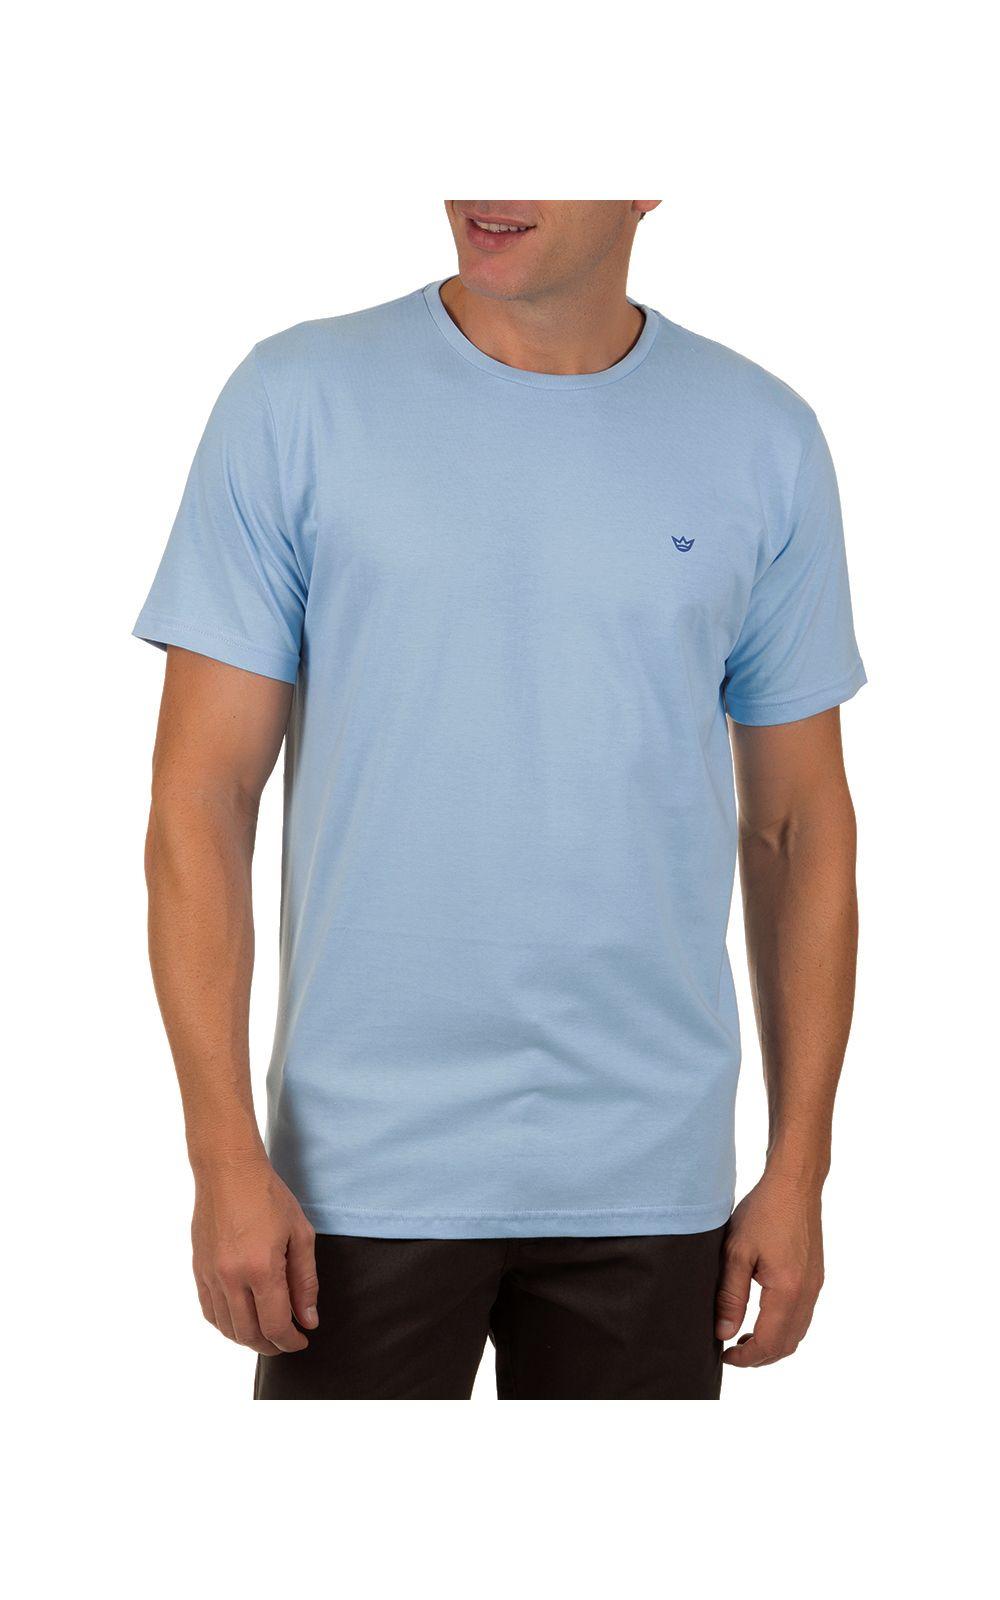 Foto 1 - Camiseta Masculina Azul Claro Lisa